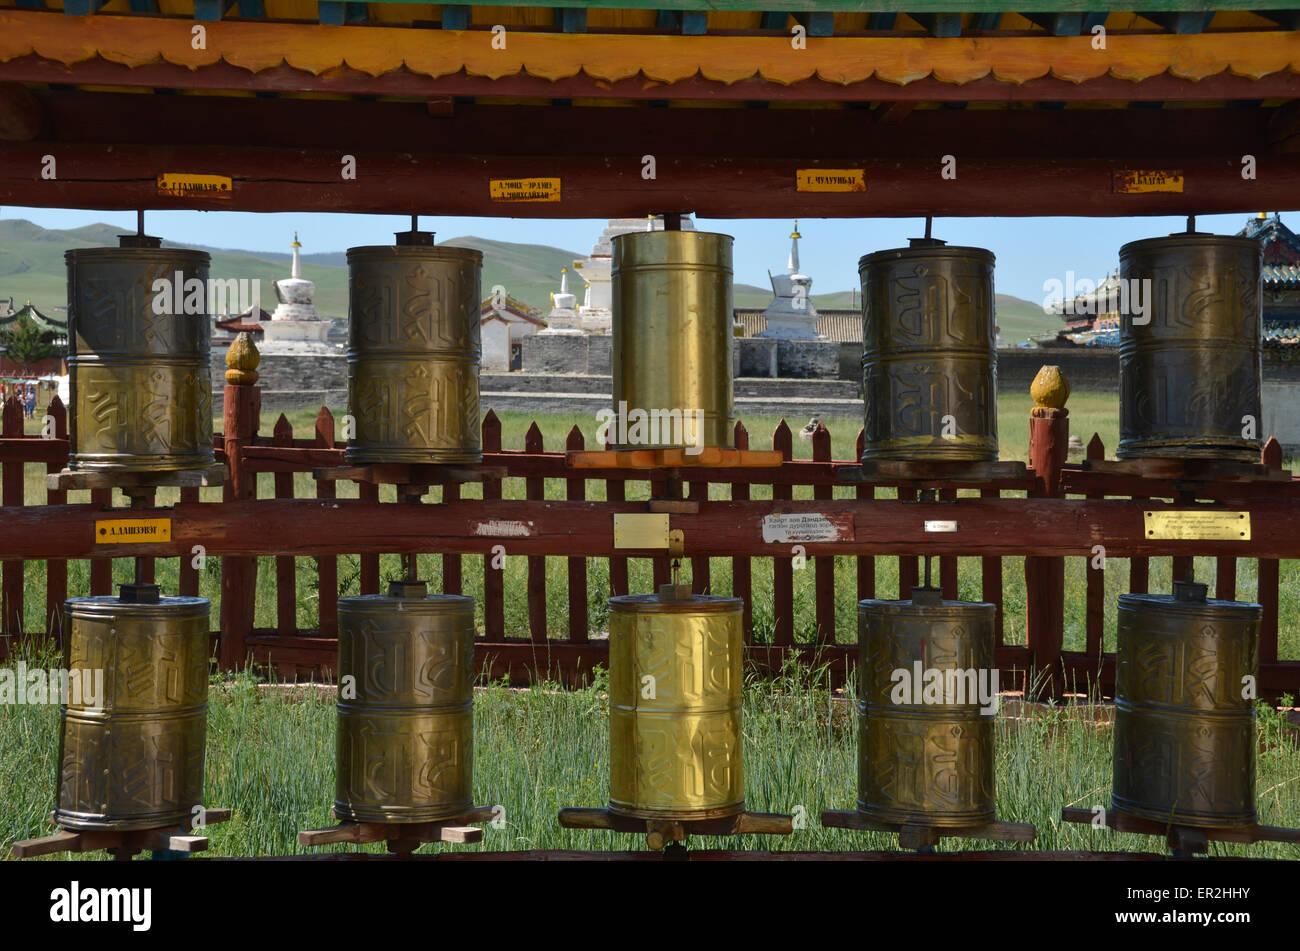 Inside the Erdene Zuu monastery complex in Karakorum, Ovorkhangai province. - Stock Image